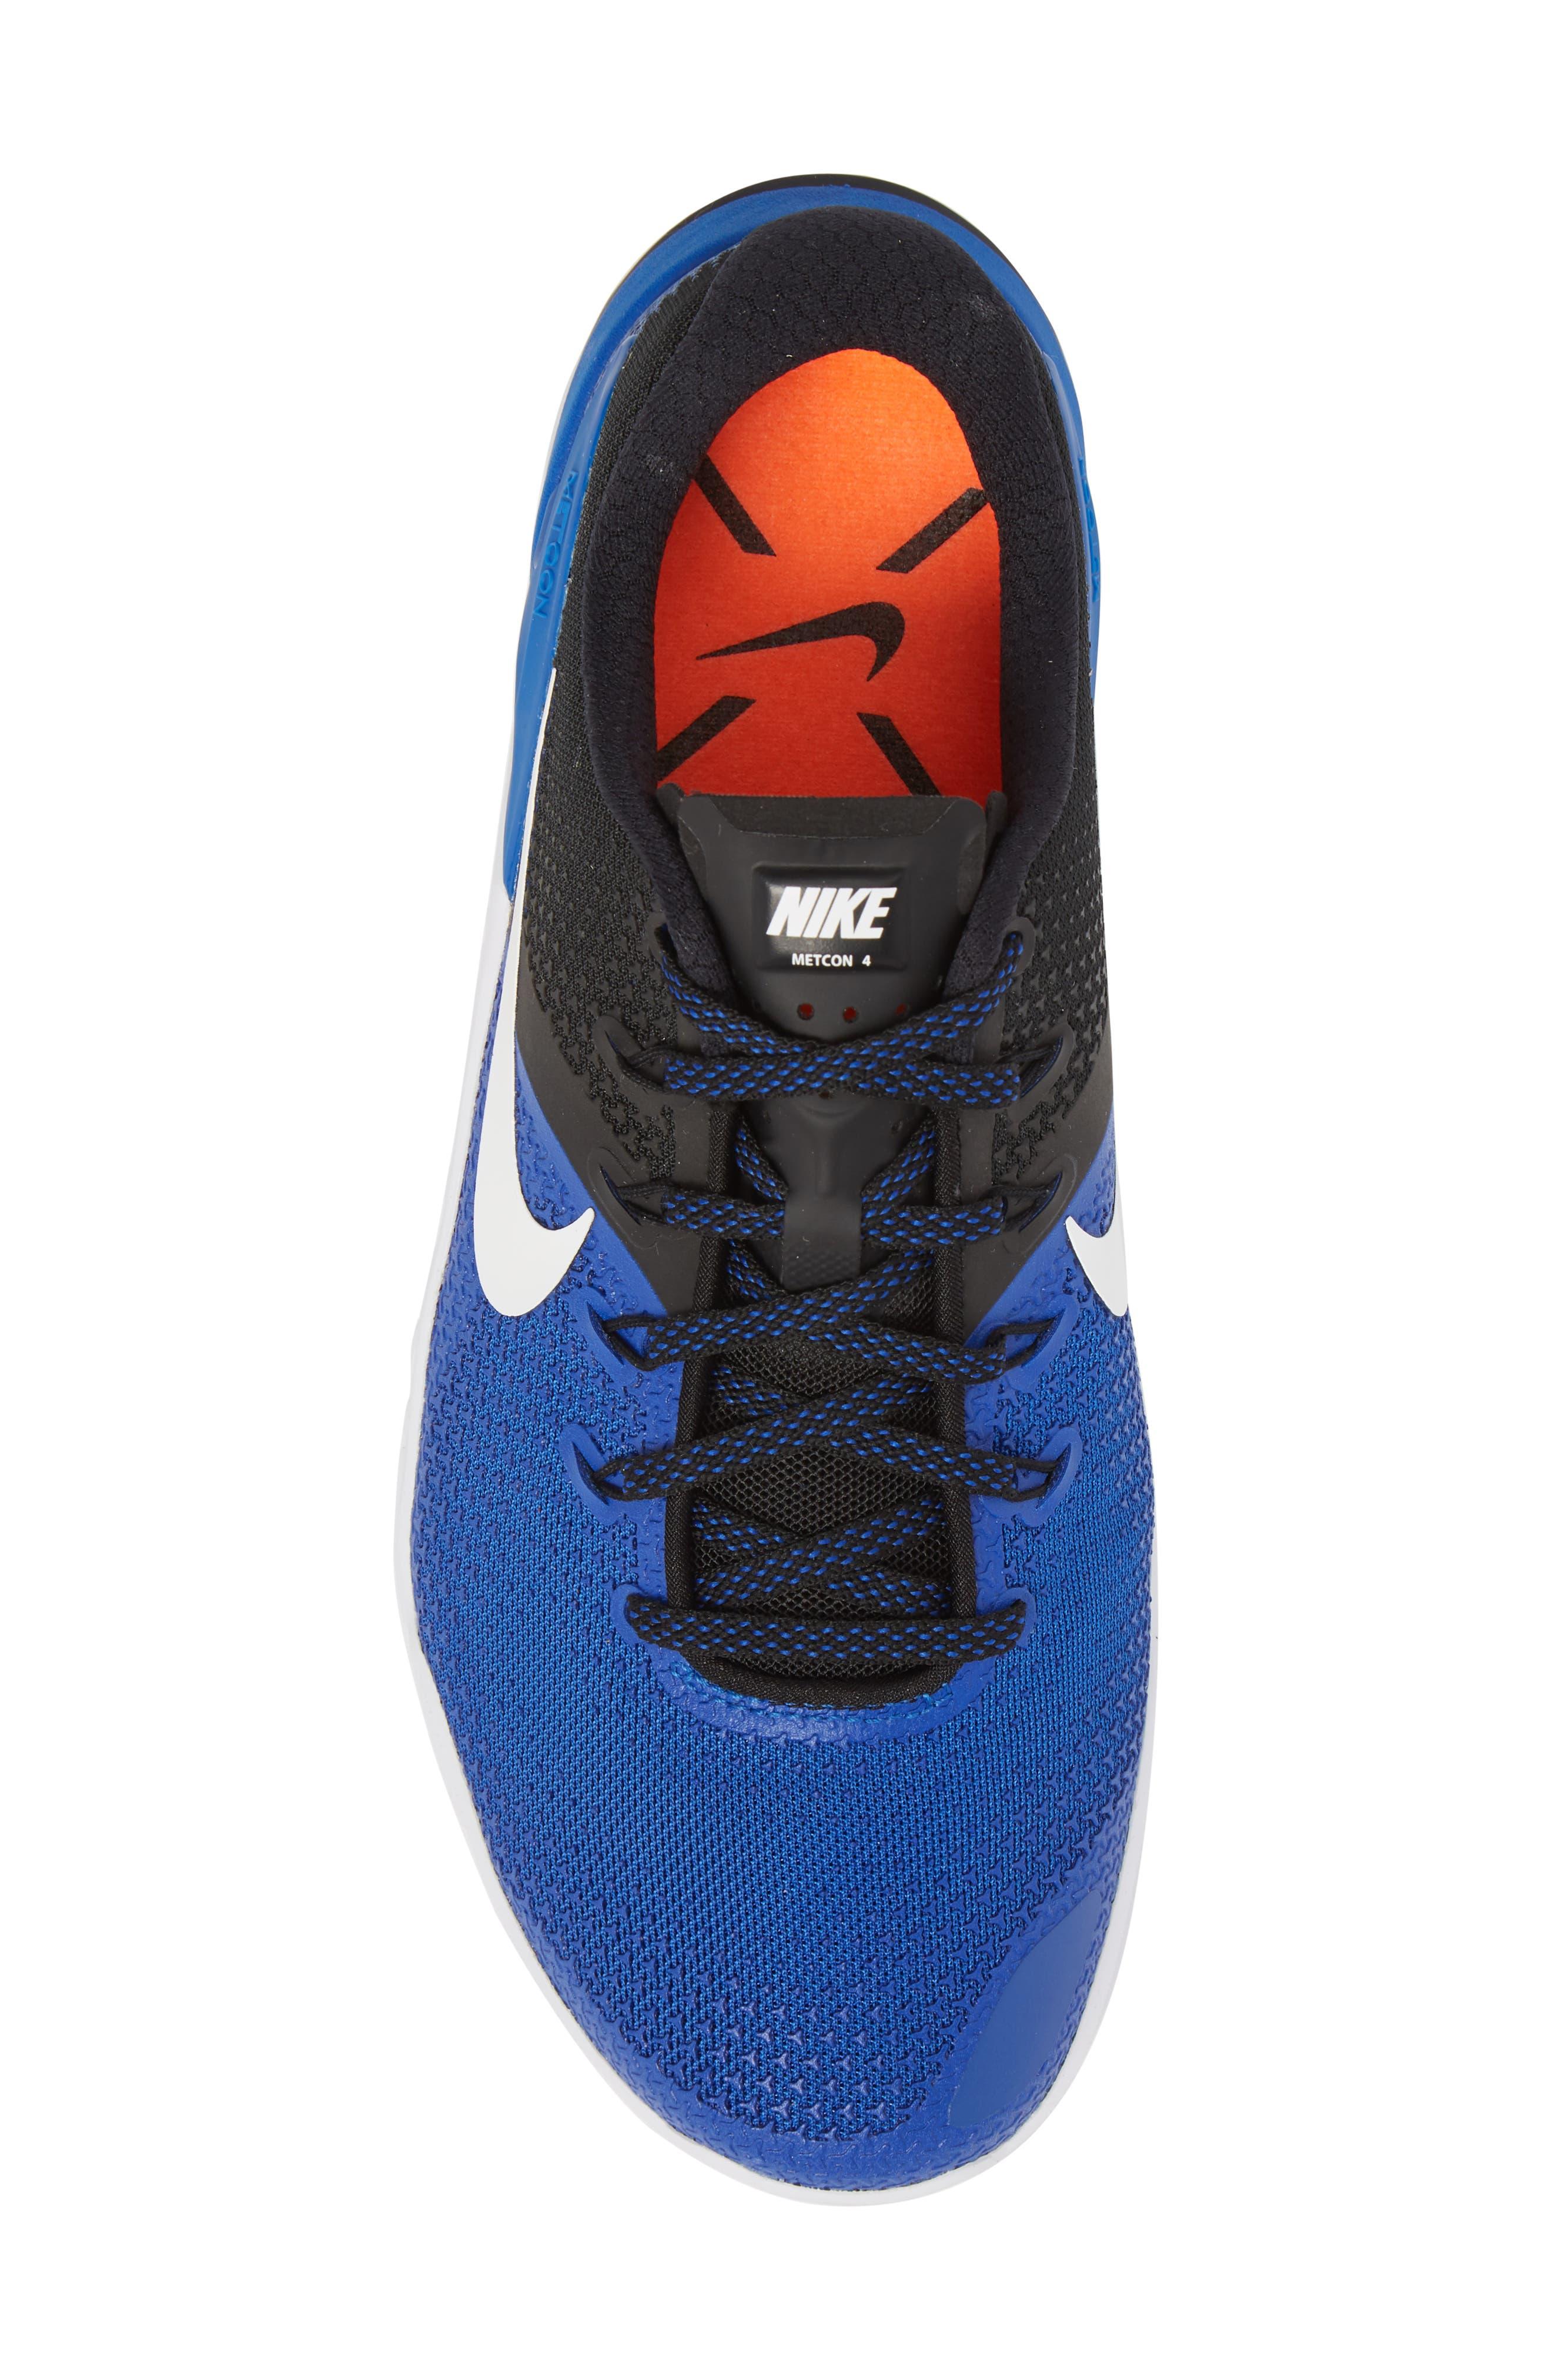 Metcon 4 Training Shoe,                             Alternate thumbnail 5, color,                             410